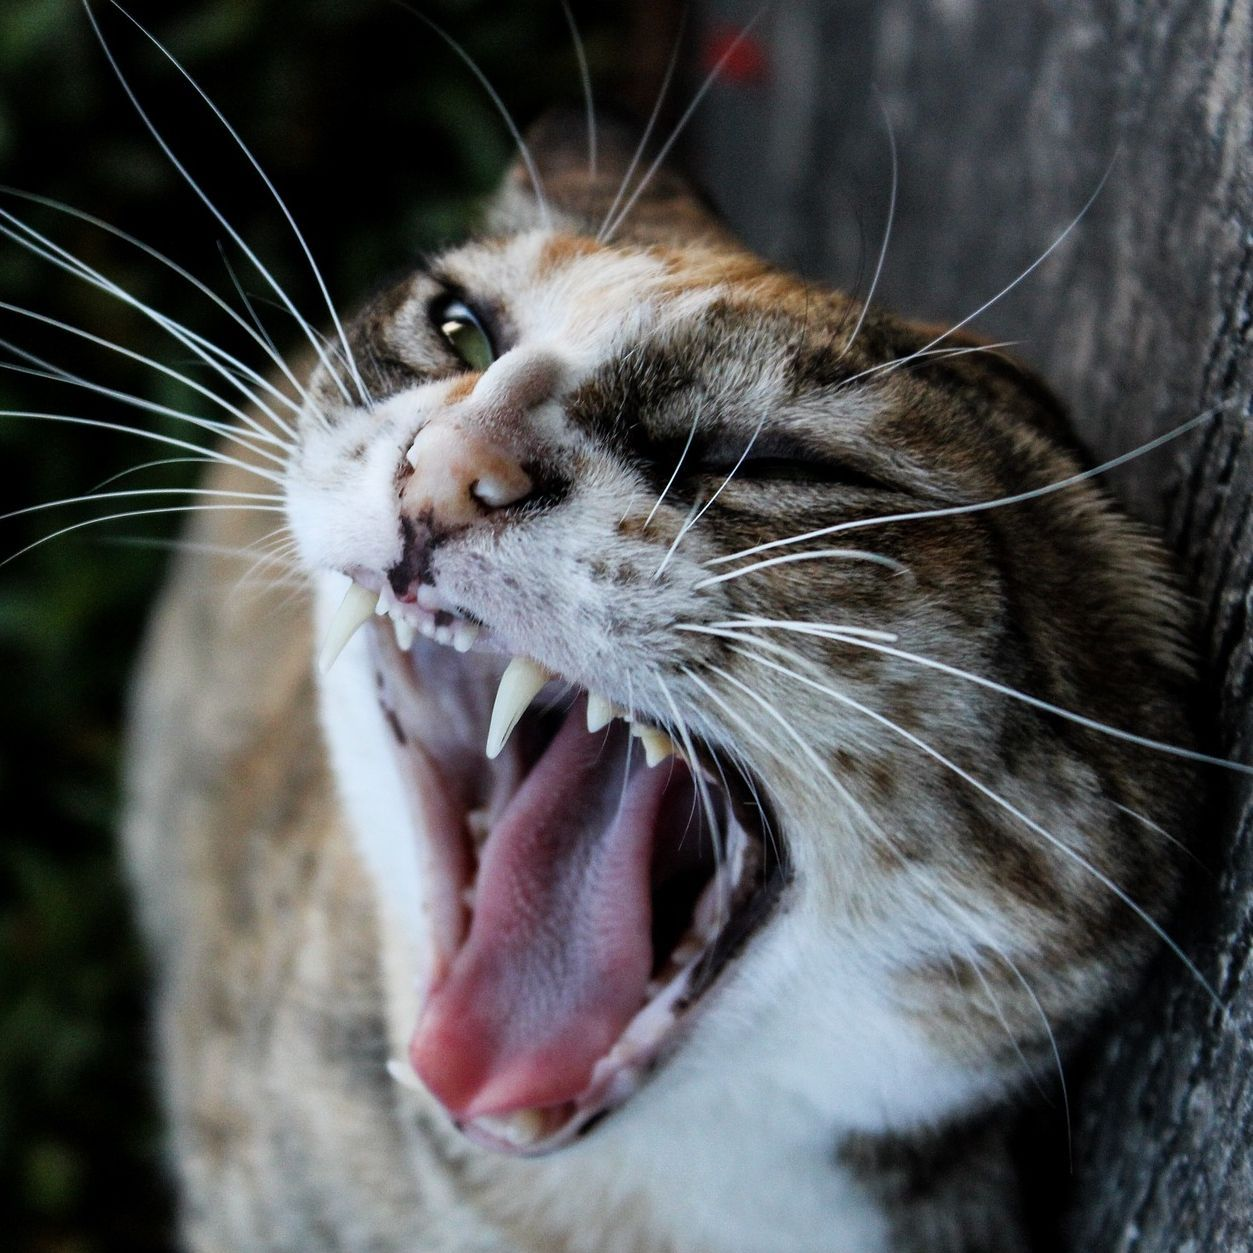 Yaaaaawn Cat Yawning Catyawn Cat Yawning Cute Cats And Kittens Cats